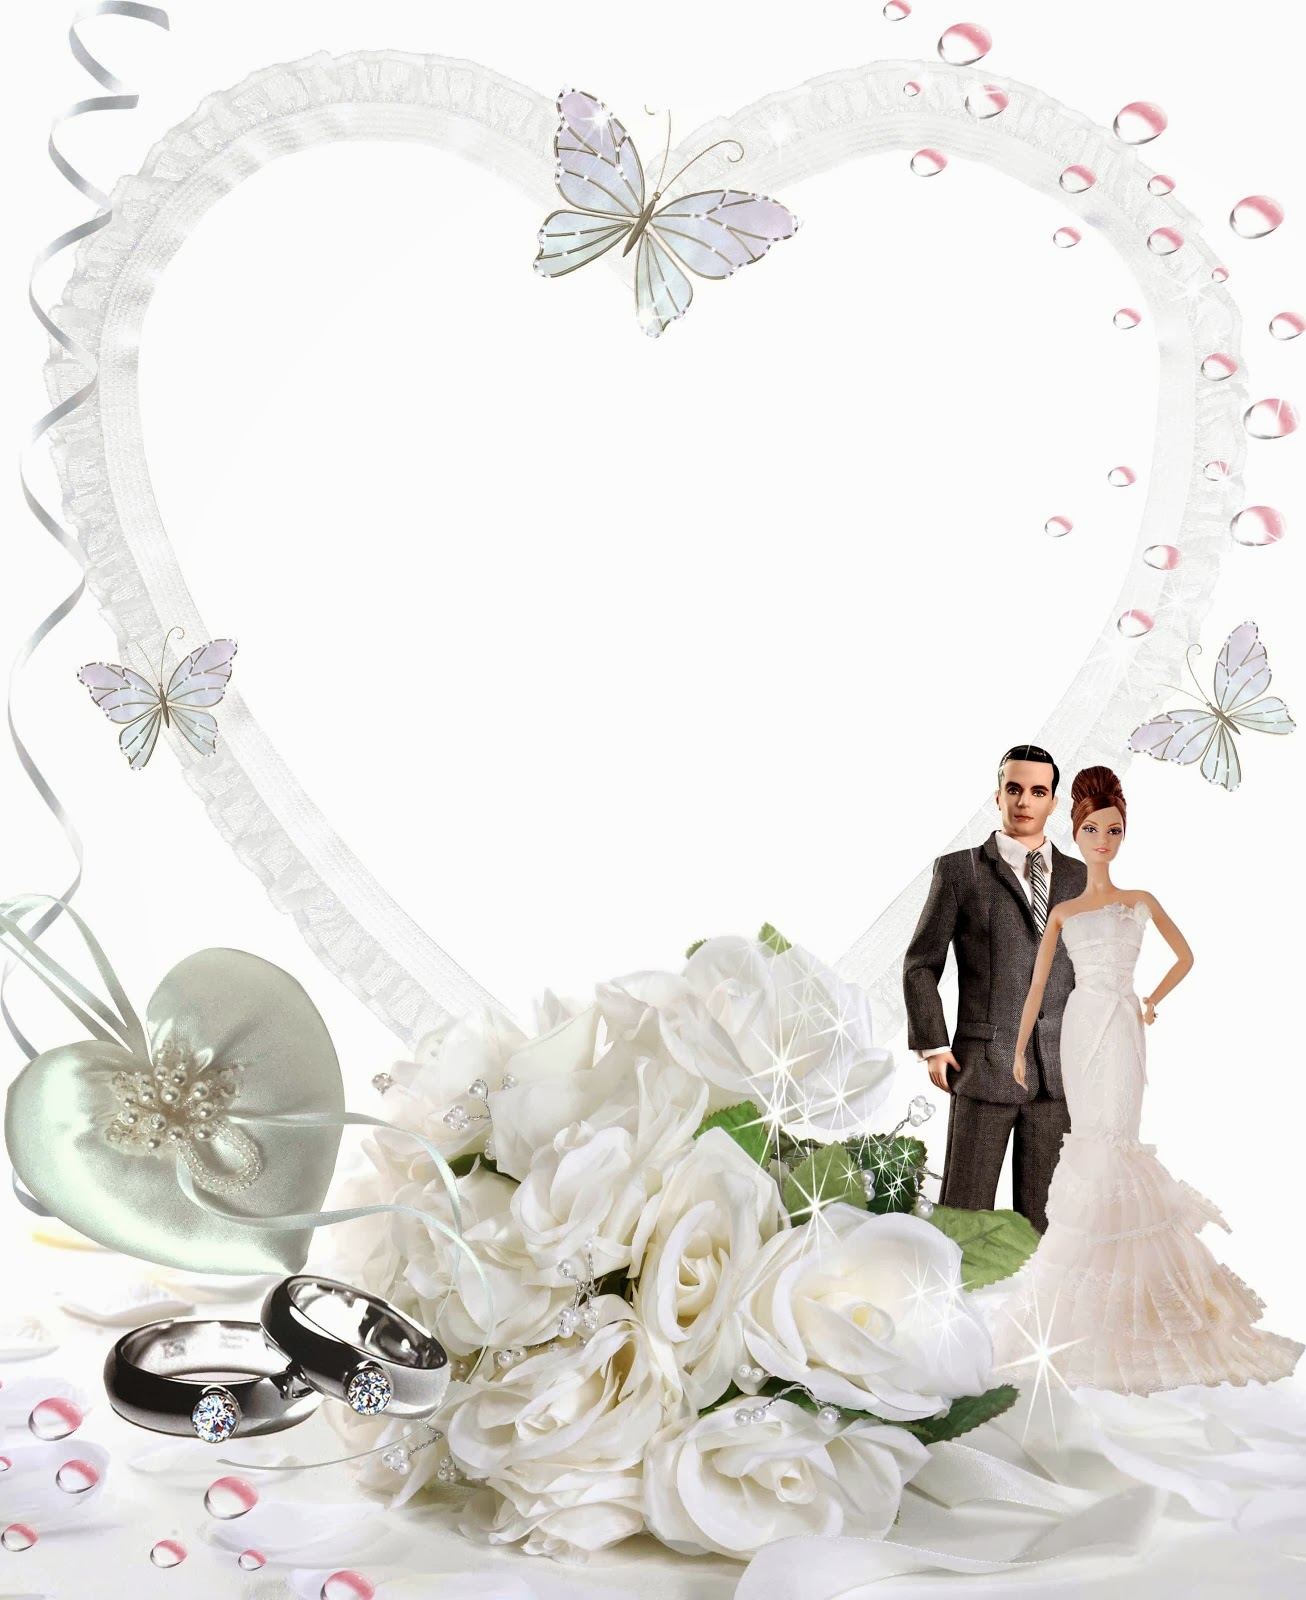 Wedding Photo Frames: My Blog